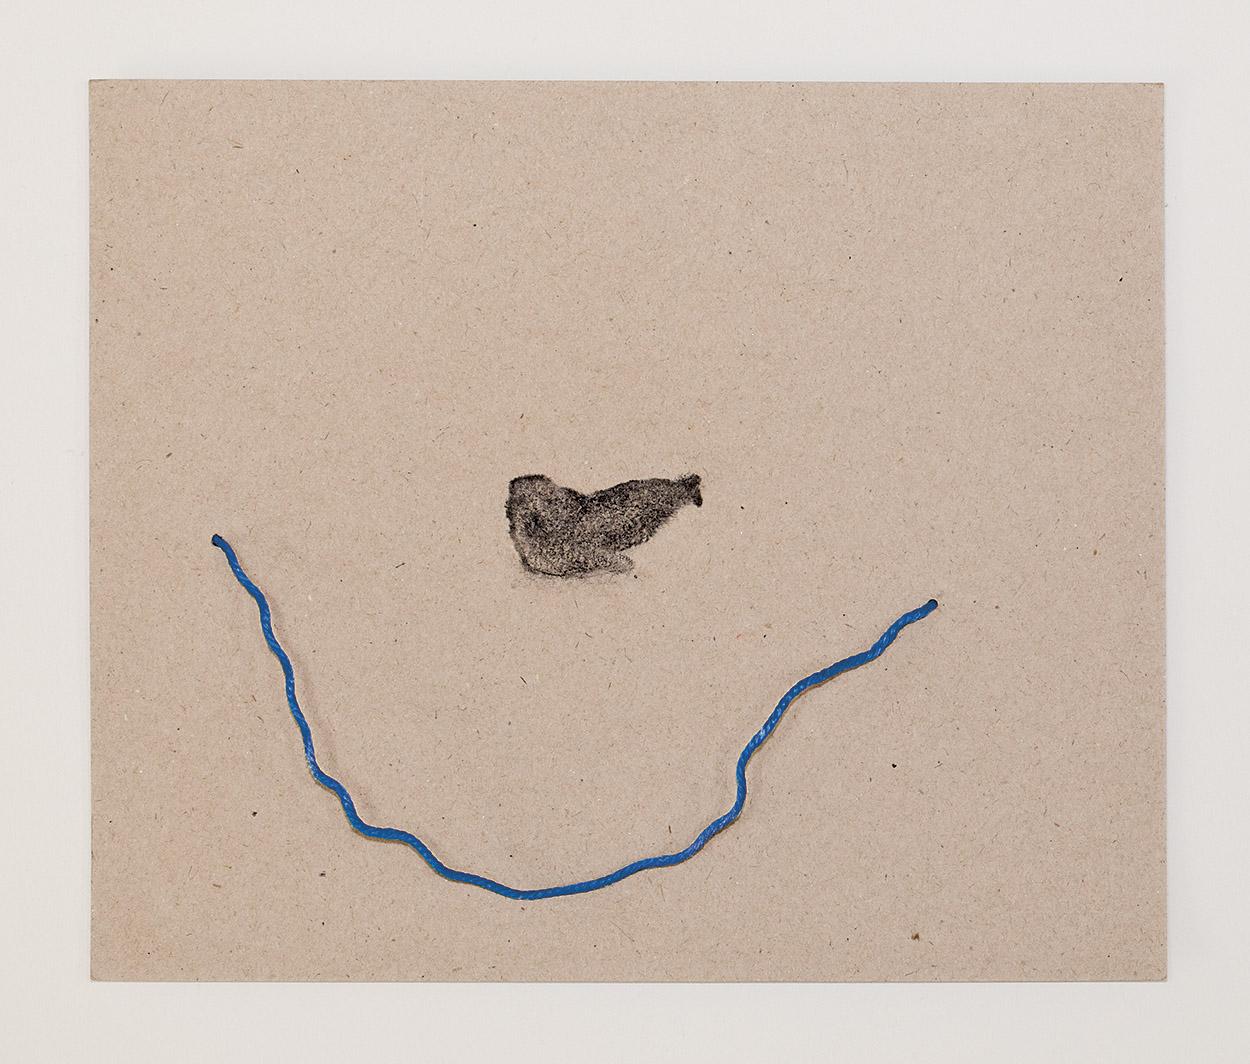 Monachus monachus II    / Foca Monge  Charcoal drawing and plastic found at the beach. 28 x 23,5 cm.